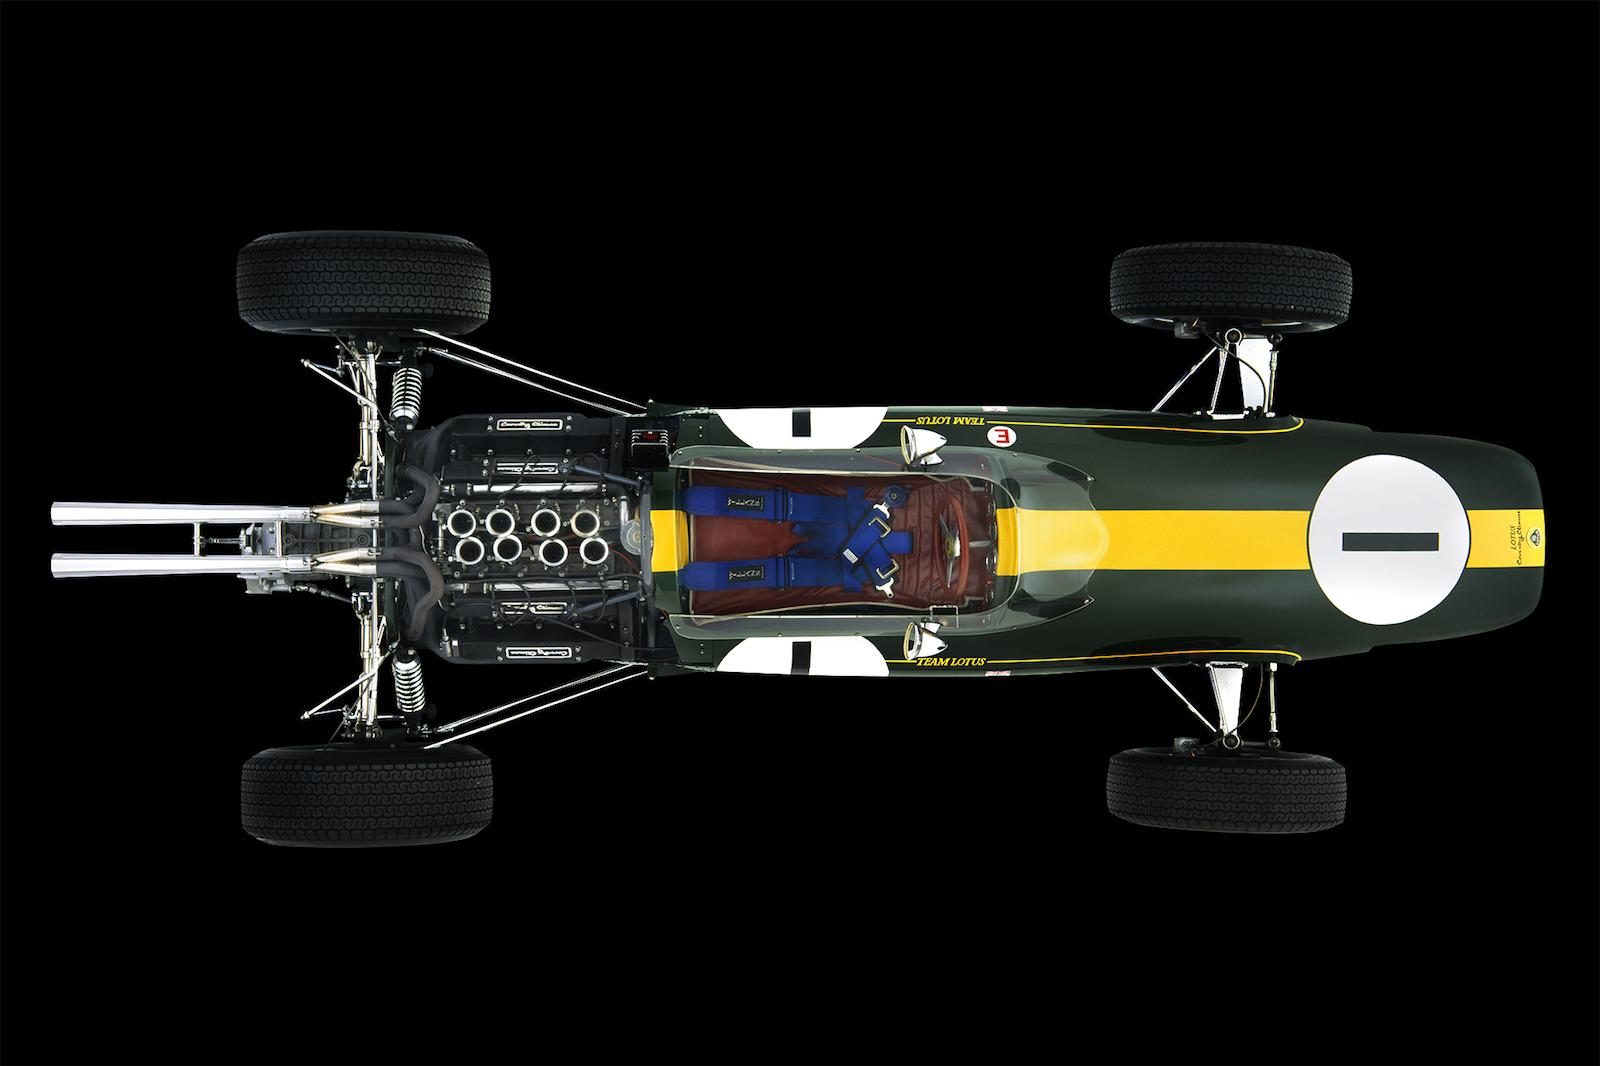 F1 Racing Retro: The Lotus 25 | Autoclassics.com